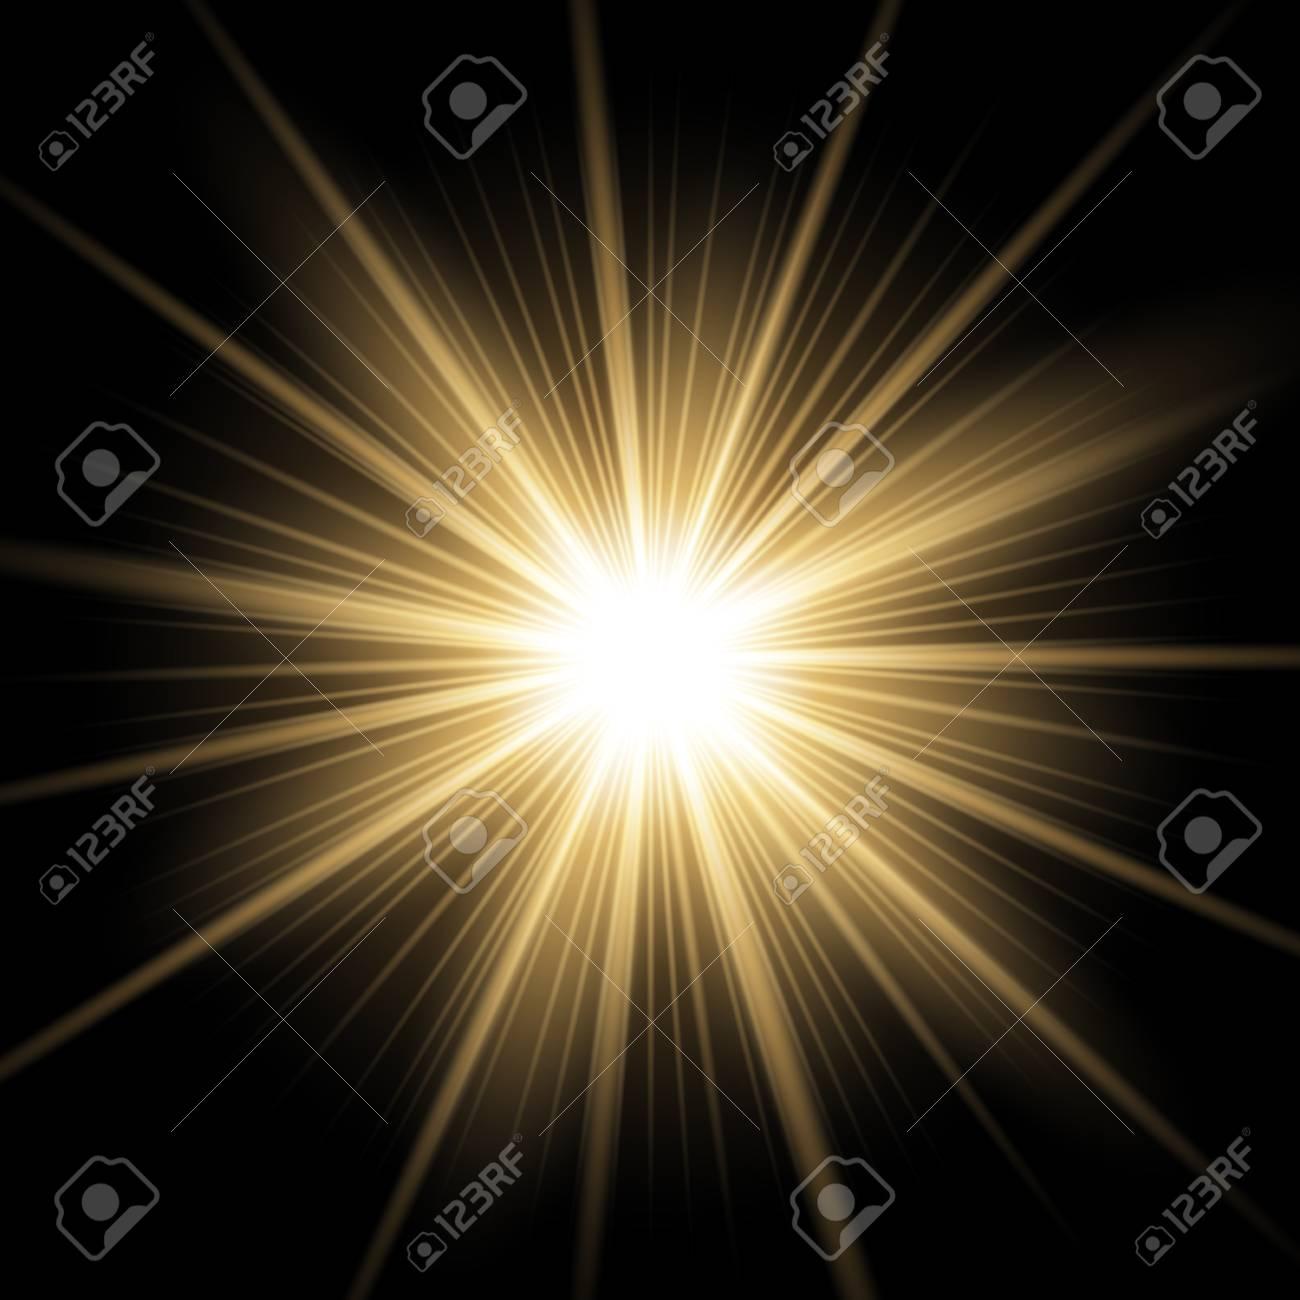 Sunlight with lens flare effect, shining star on black background, light effect, golden color - 94153263